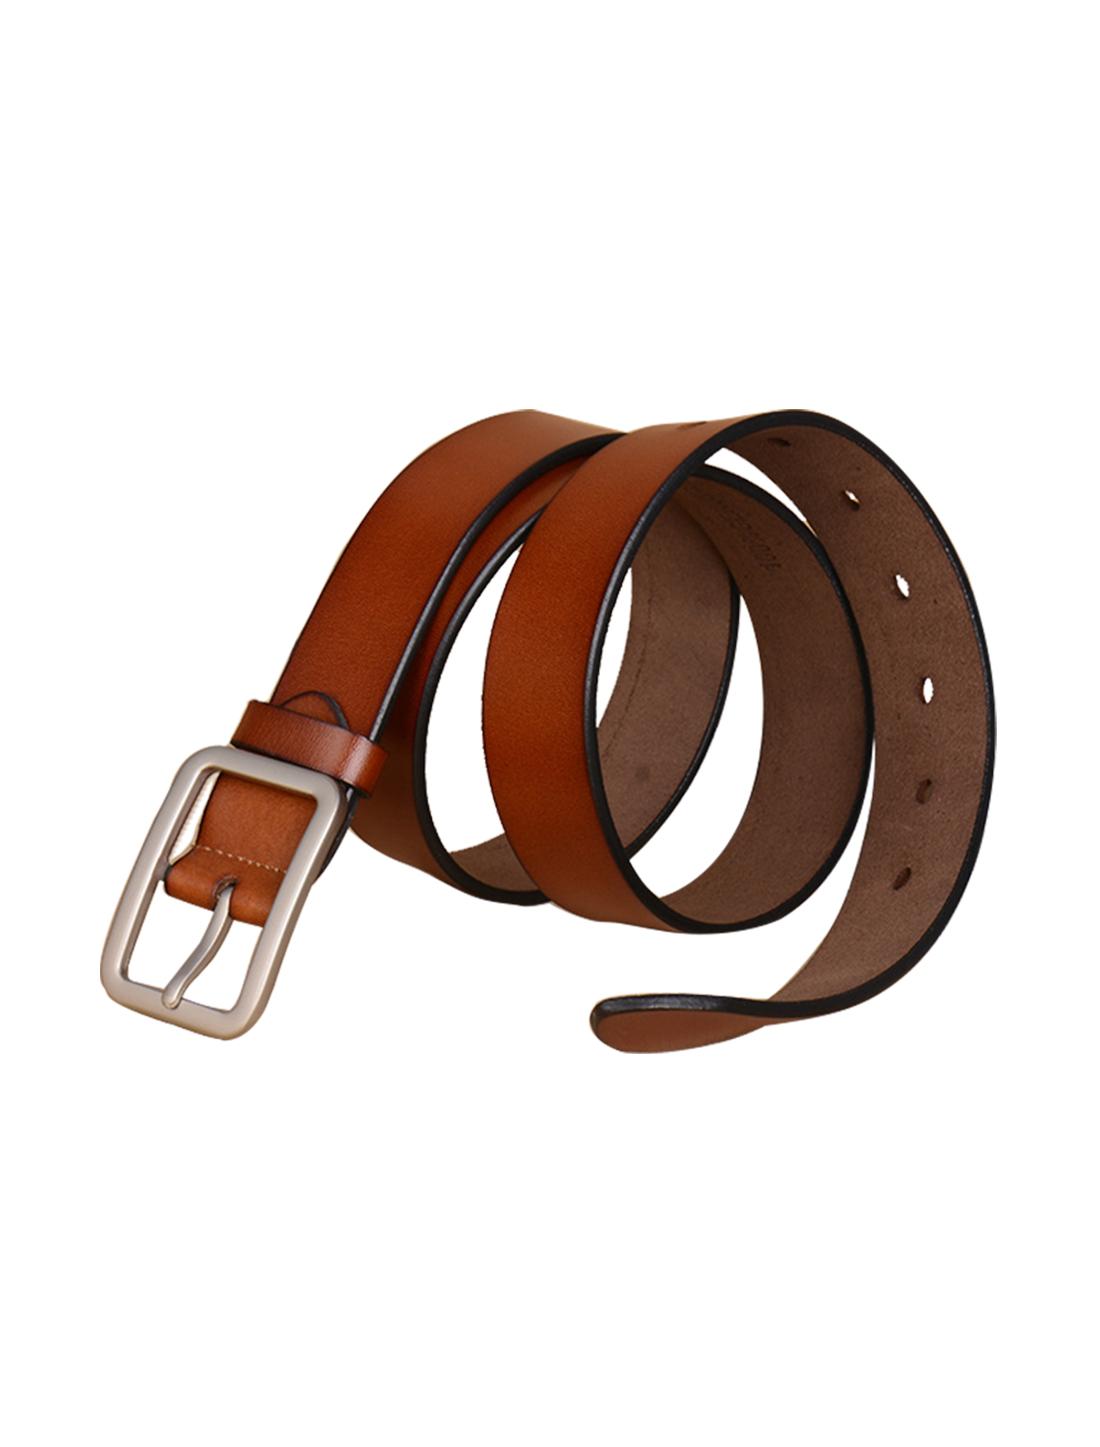 Mens Casual Single Pin Buckle Dress Leather Belt 33mm Width 1 1/4 Brown 110cm